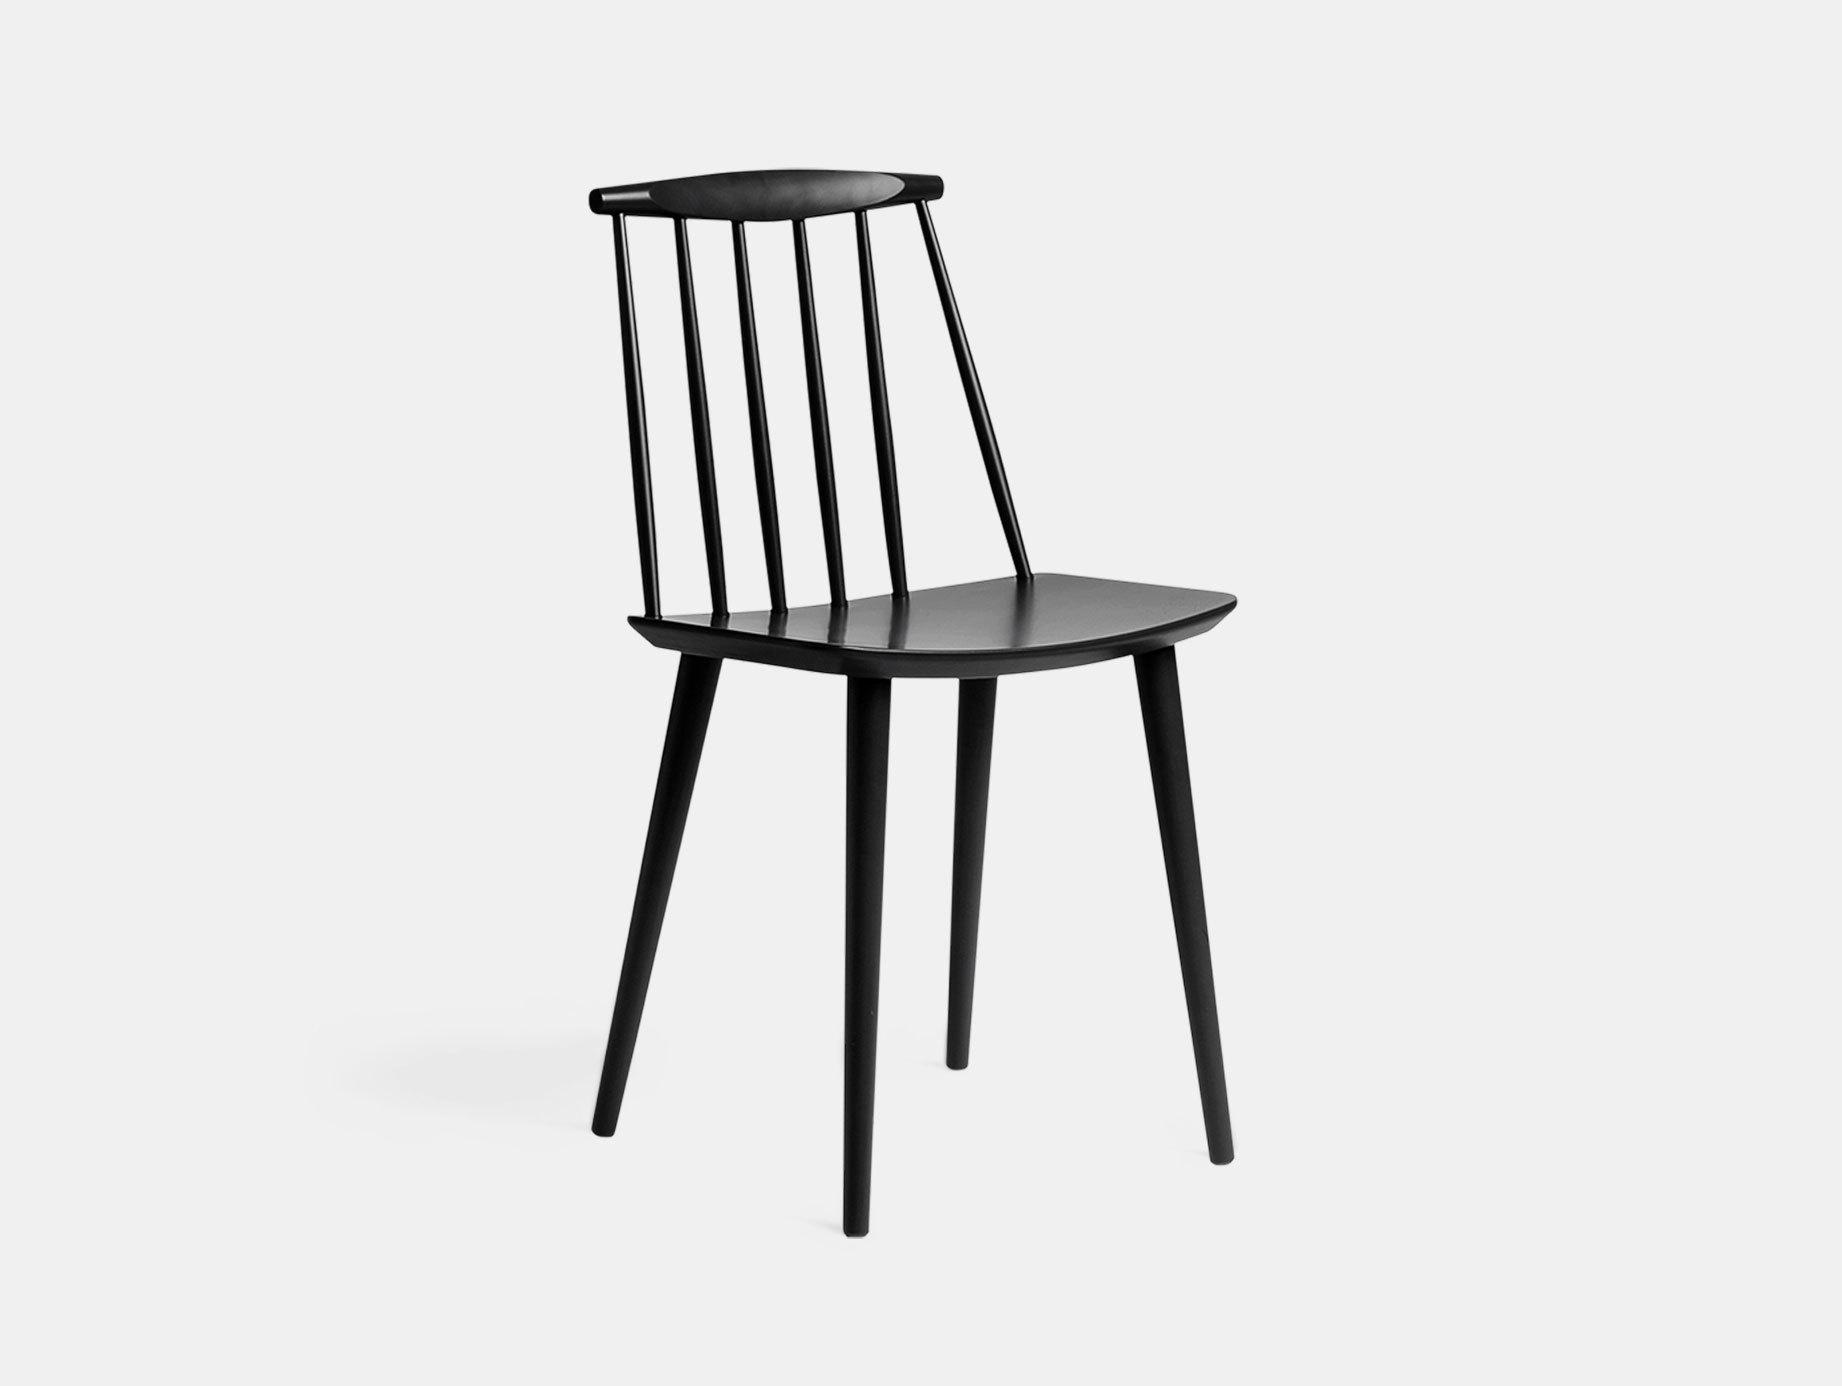 J77 Chair image 3